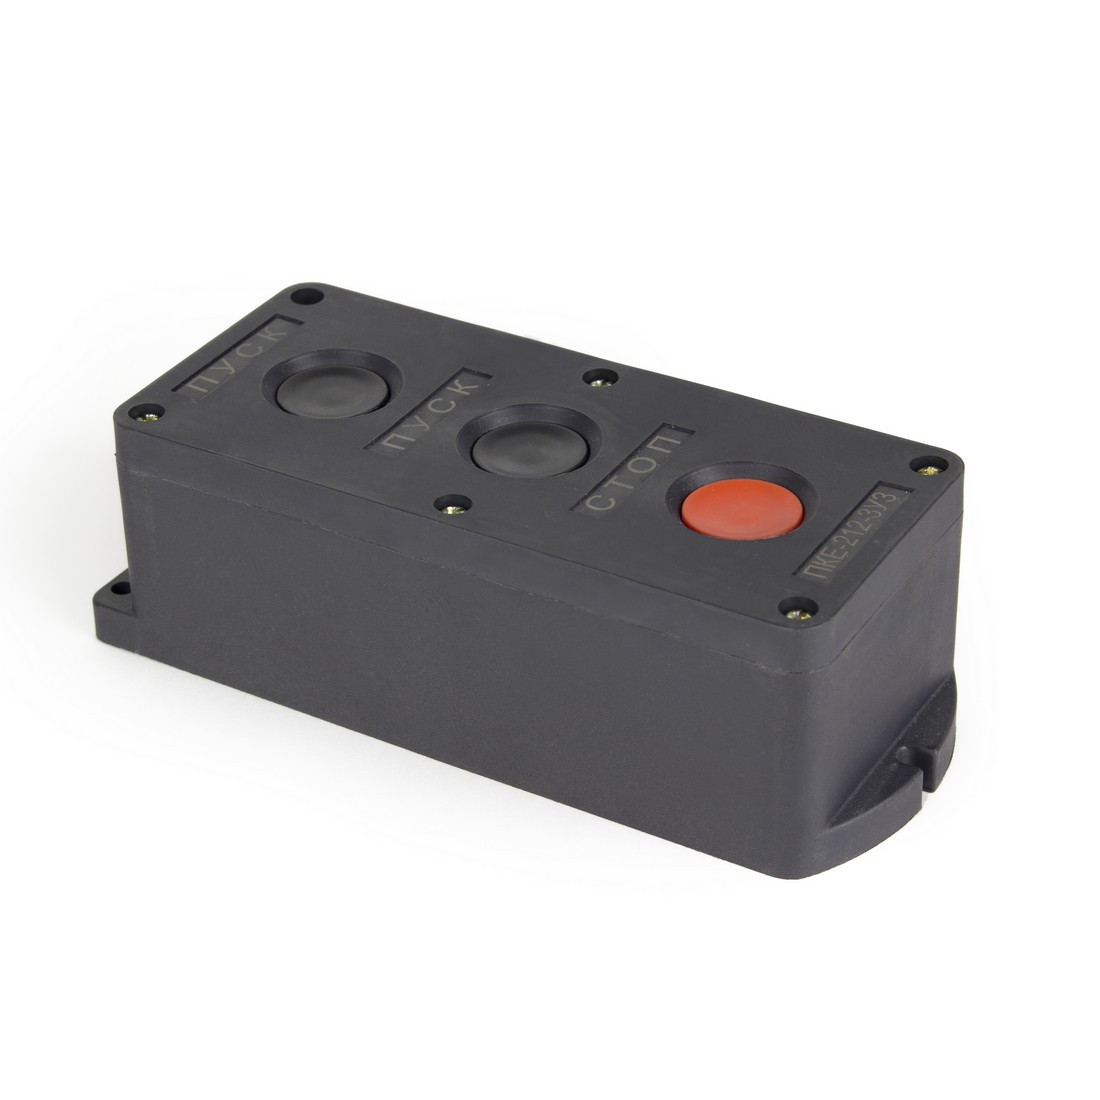 Пост кнопочный Deluxe ПКЕ-212-3 пуск-пуск-стоп